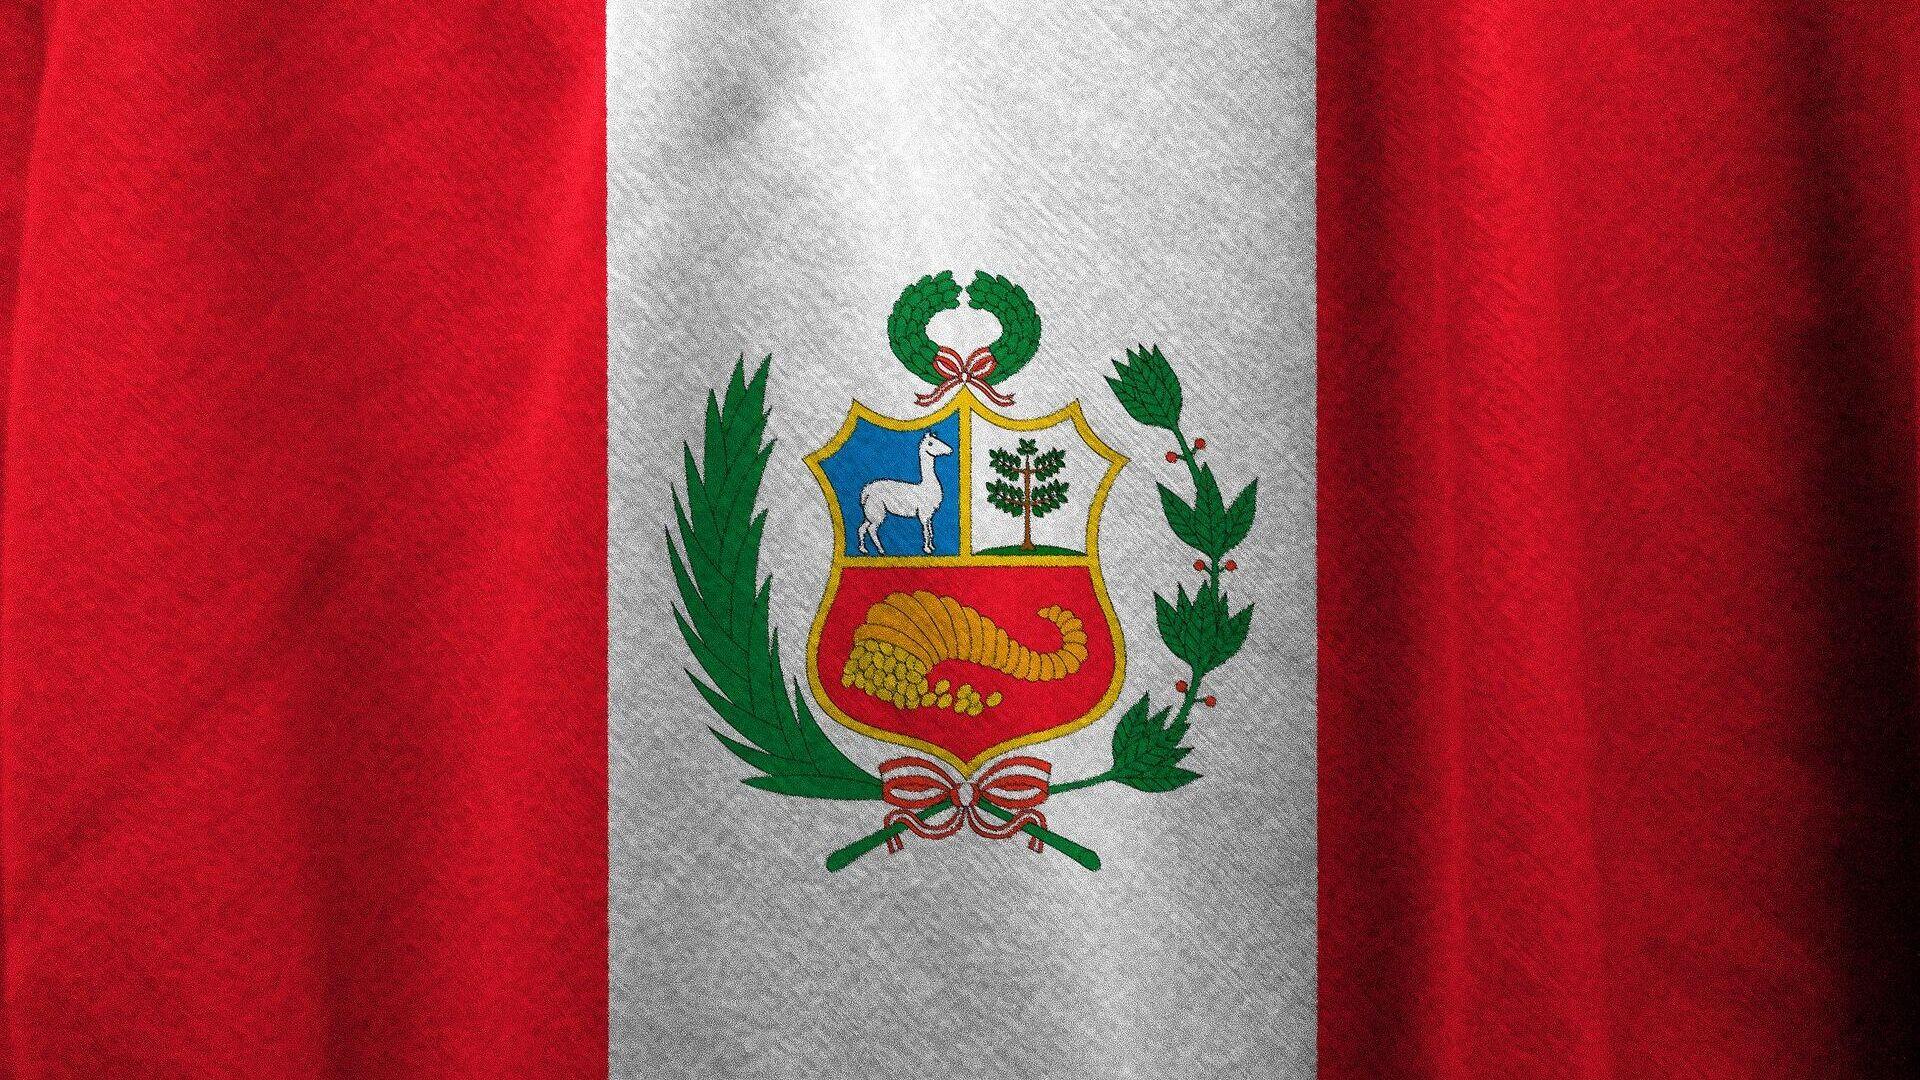 Bandera de Perú. Imagen referencial - Sputnik Mundo, 1920, 03.06.2021